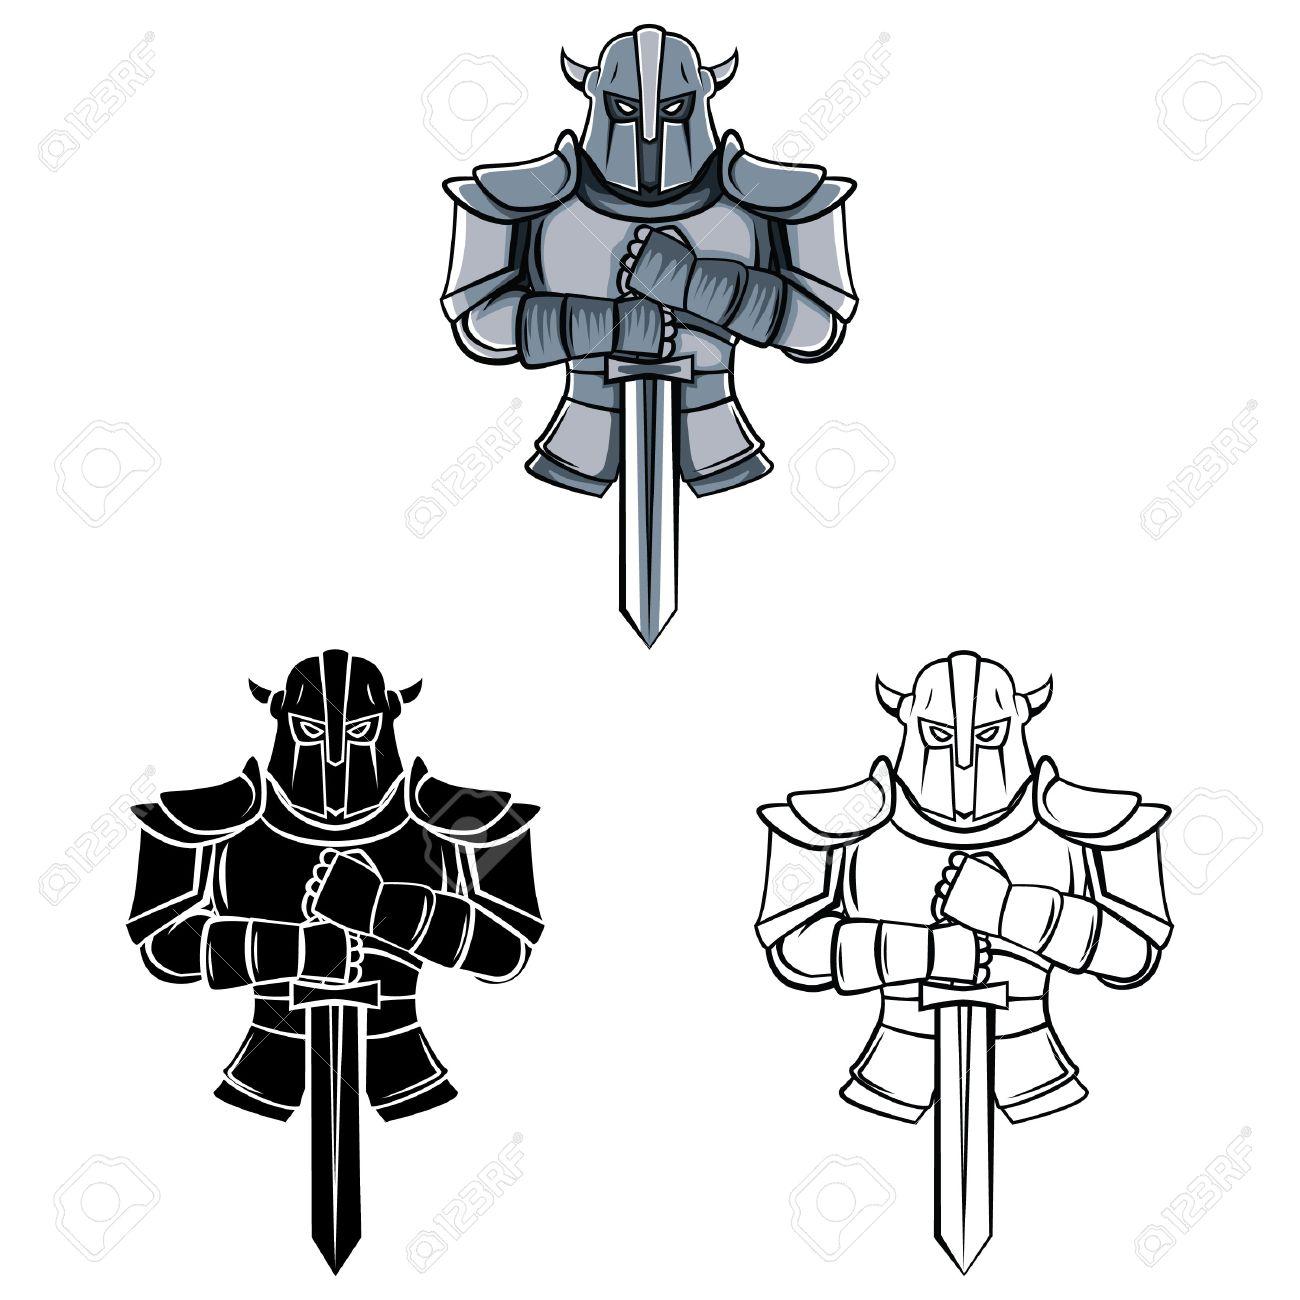 Coloring Book Knight Cartoon Character - Vector Illustration Royalty ...